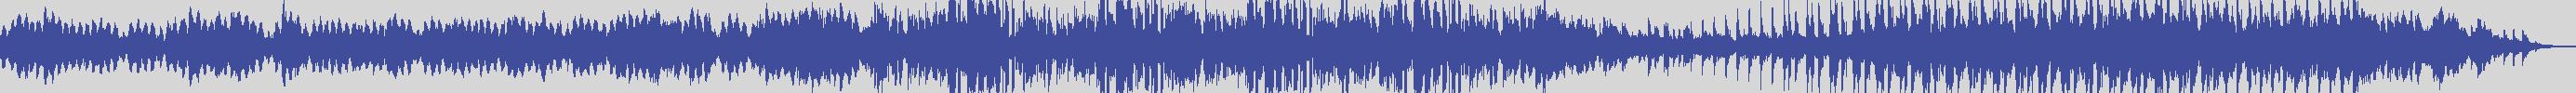 worldwide_music_records [WMR004] Difetti Sonori - Crystal Dream [Original Mix] audio wave form